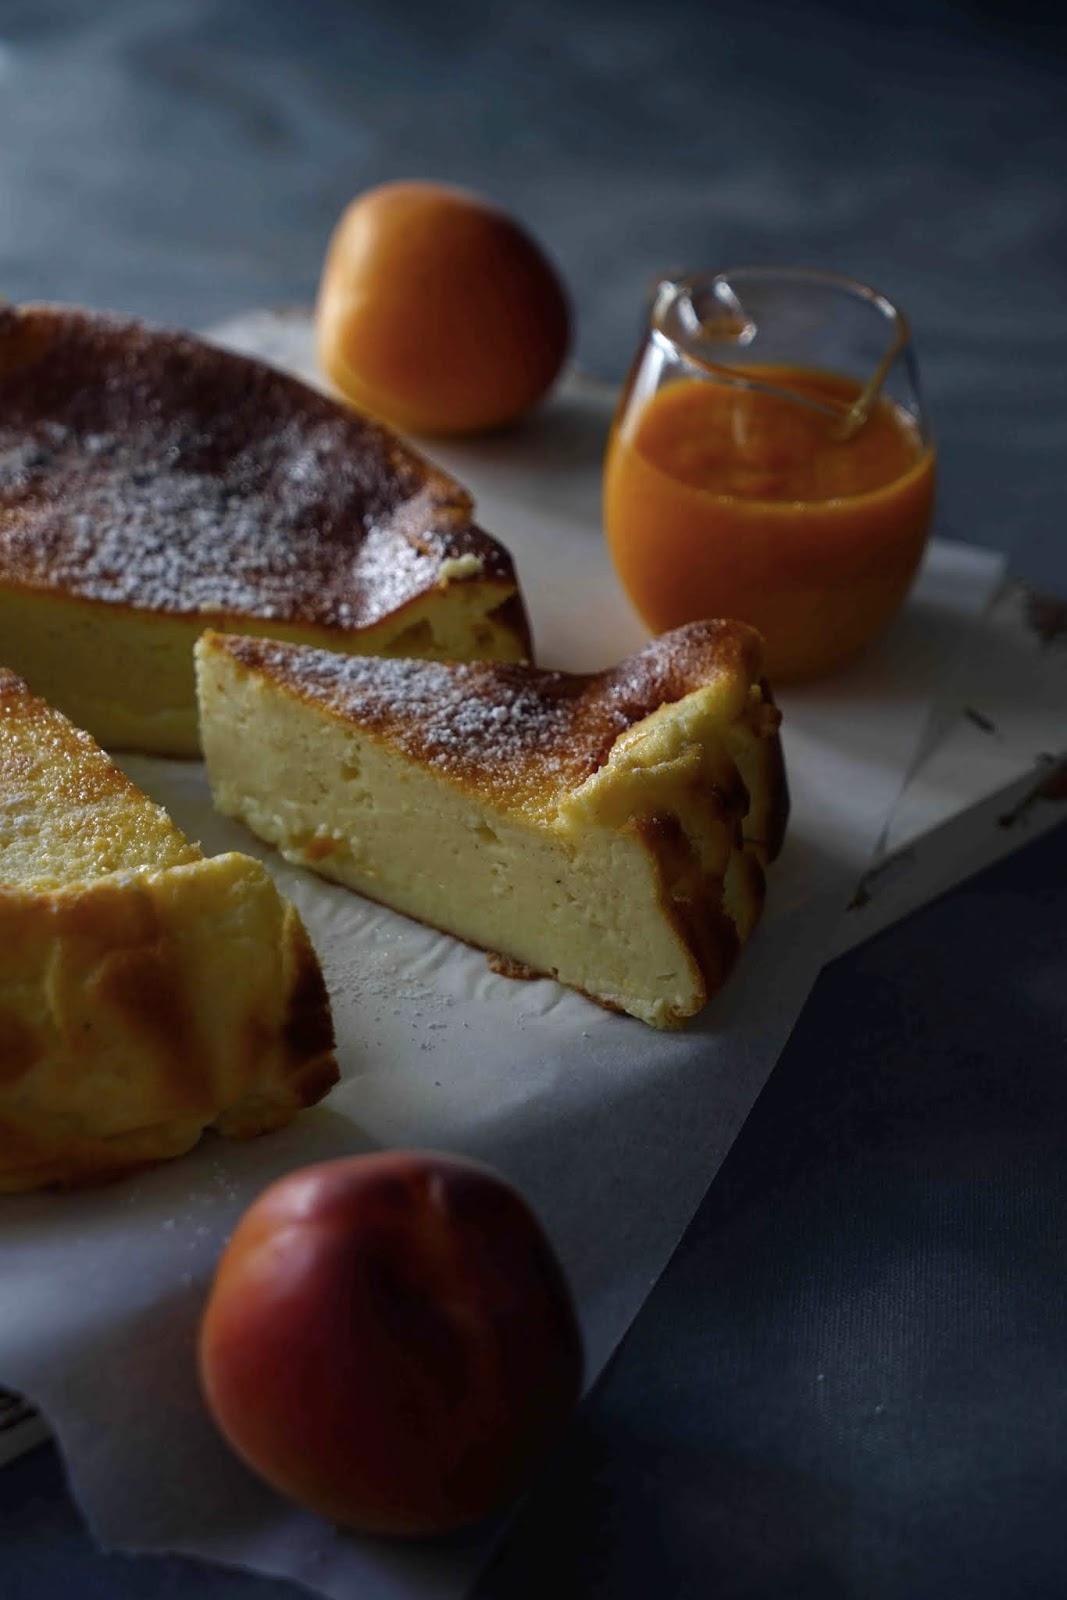 dessert au fromage blanc , gâteau leger , gouter maison , cheesecake